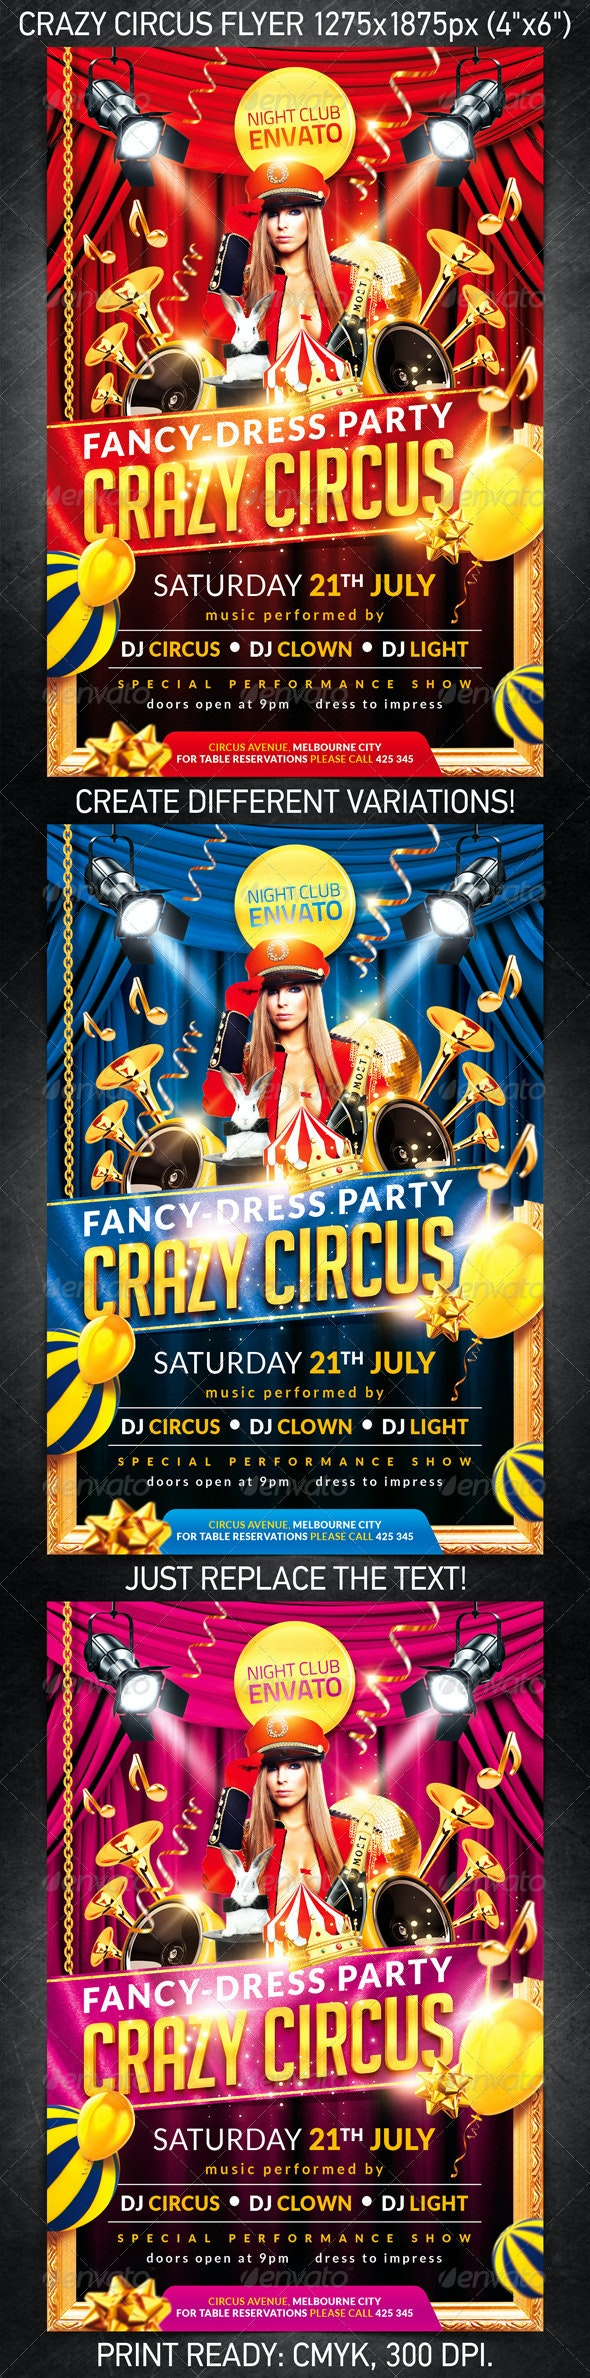 Crazy Circus Party Flyer - Flyers Print Templates